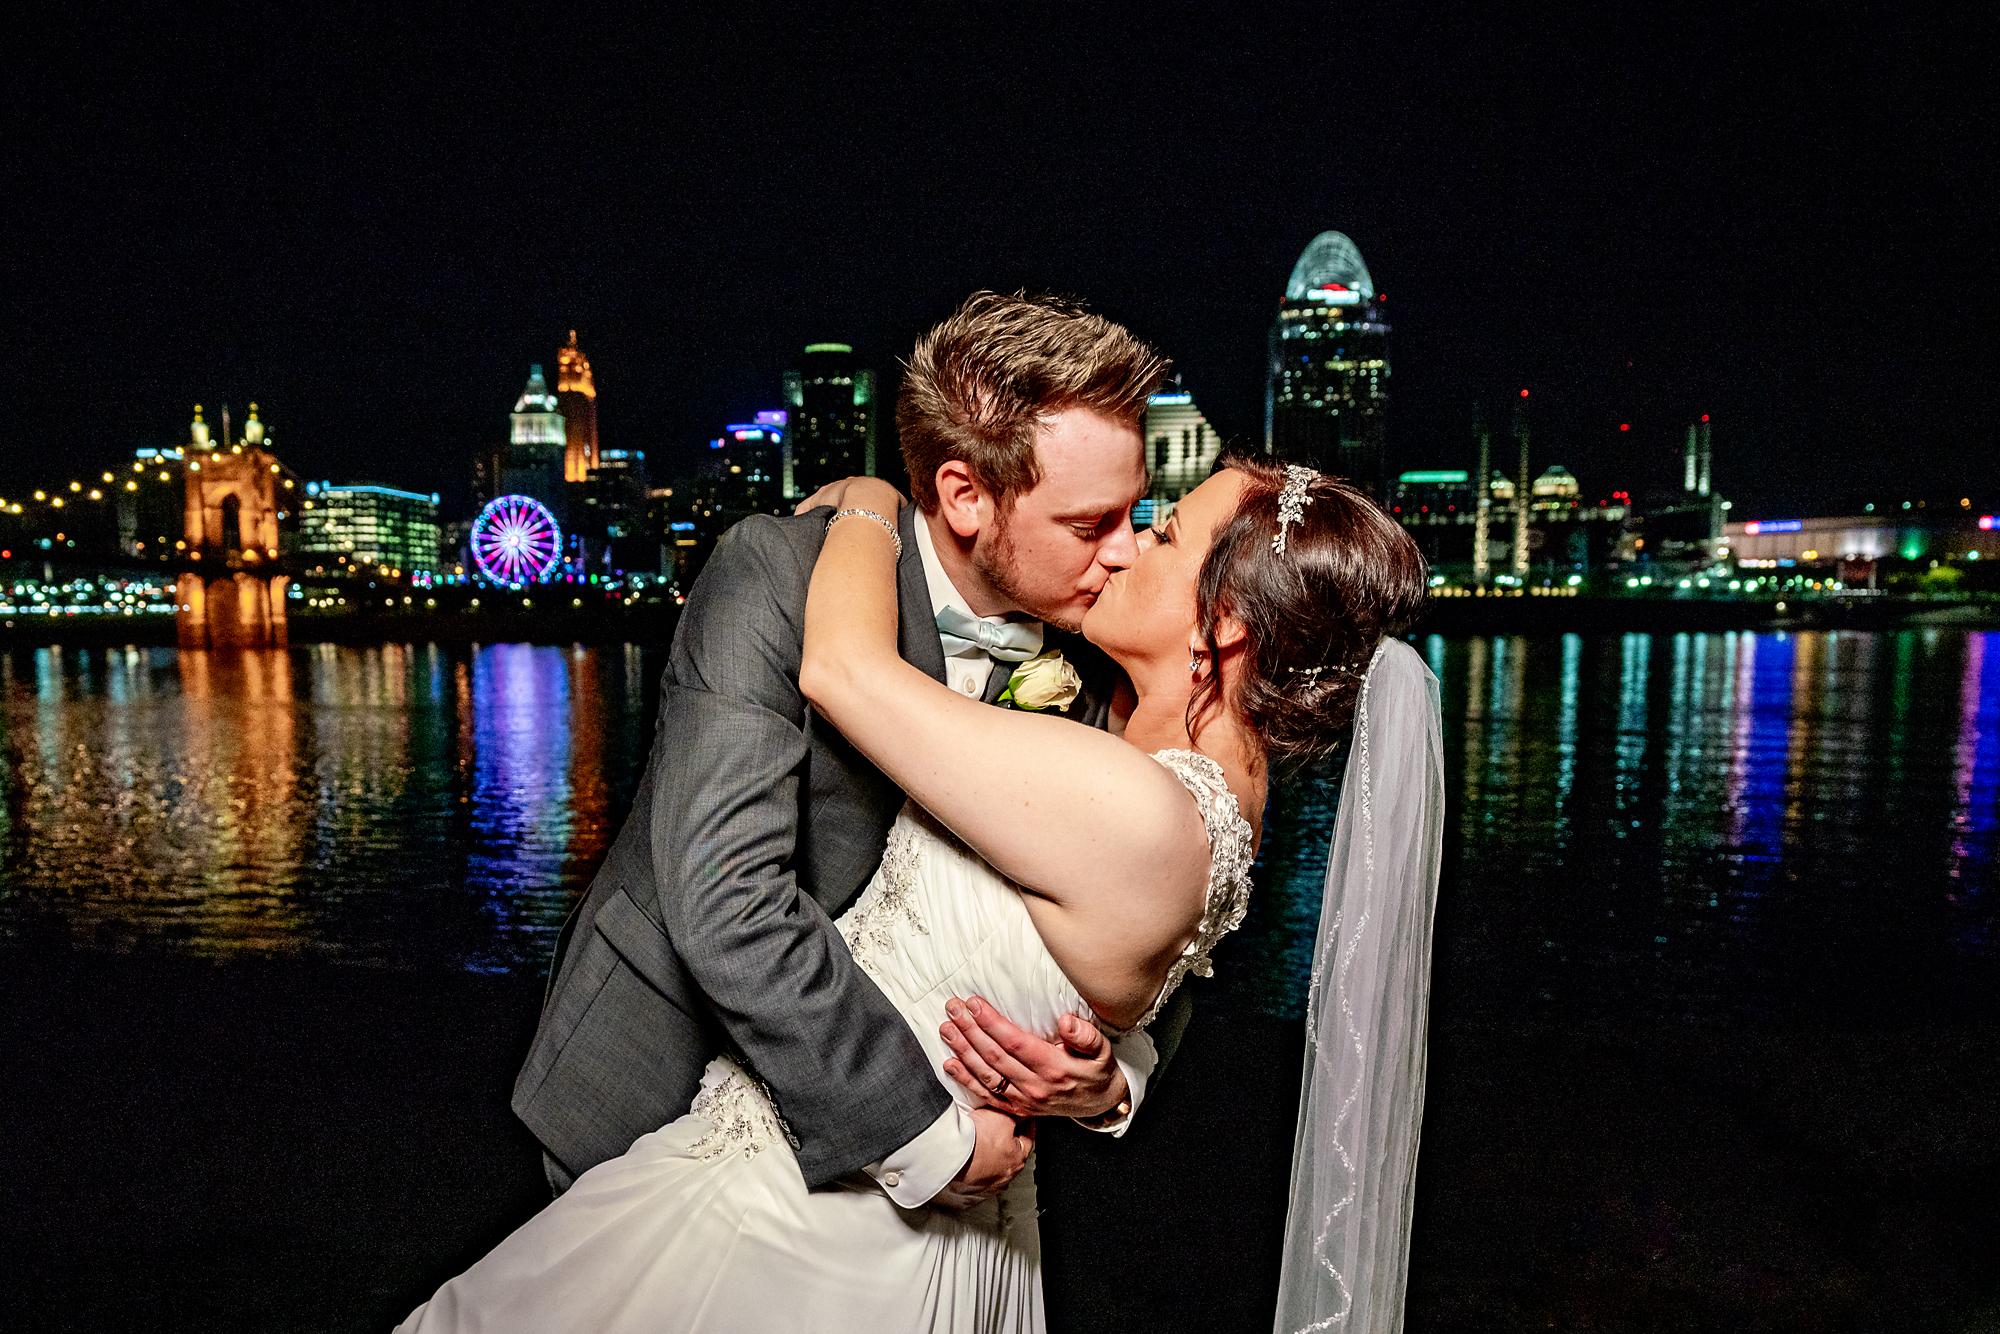 George-Rogers-Clark-Park-Newport-Covington-Kentucky-Wedding-Photography-2.jpg